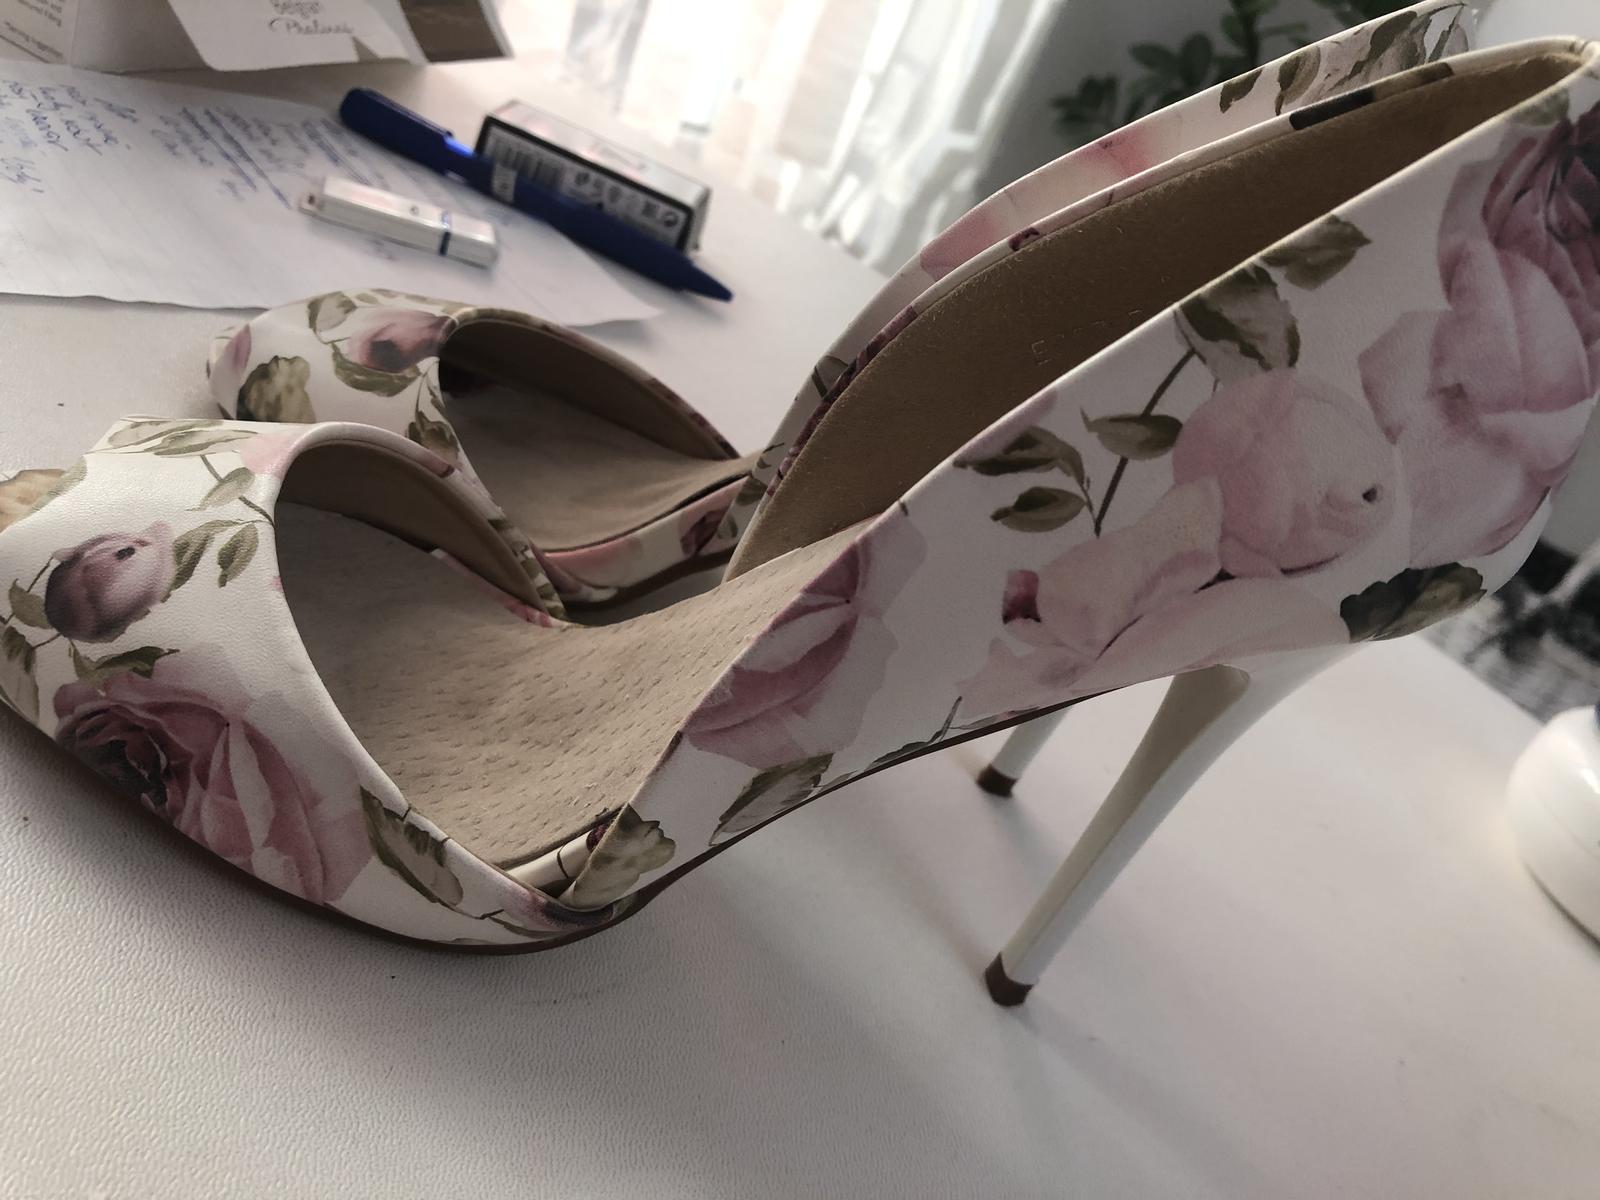 Letné sandálky s kvetmi - Obrázok č. 2